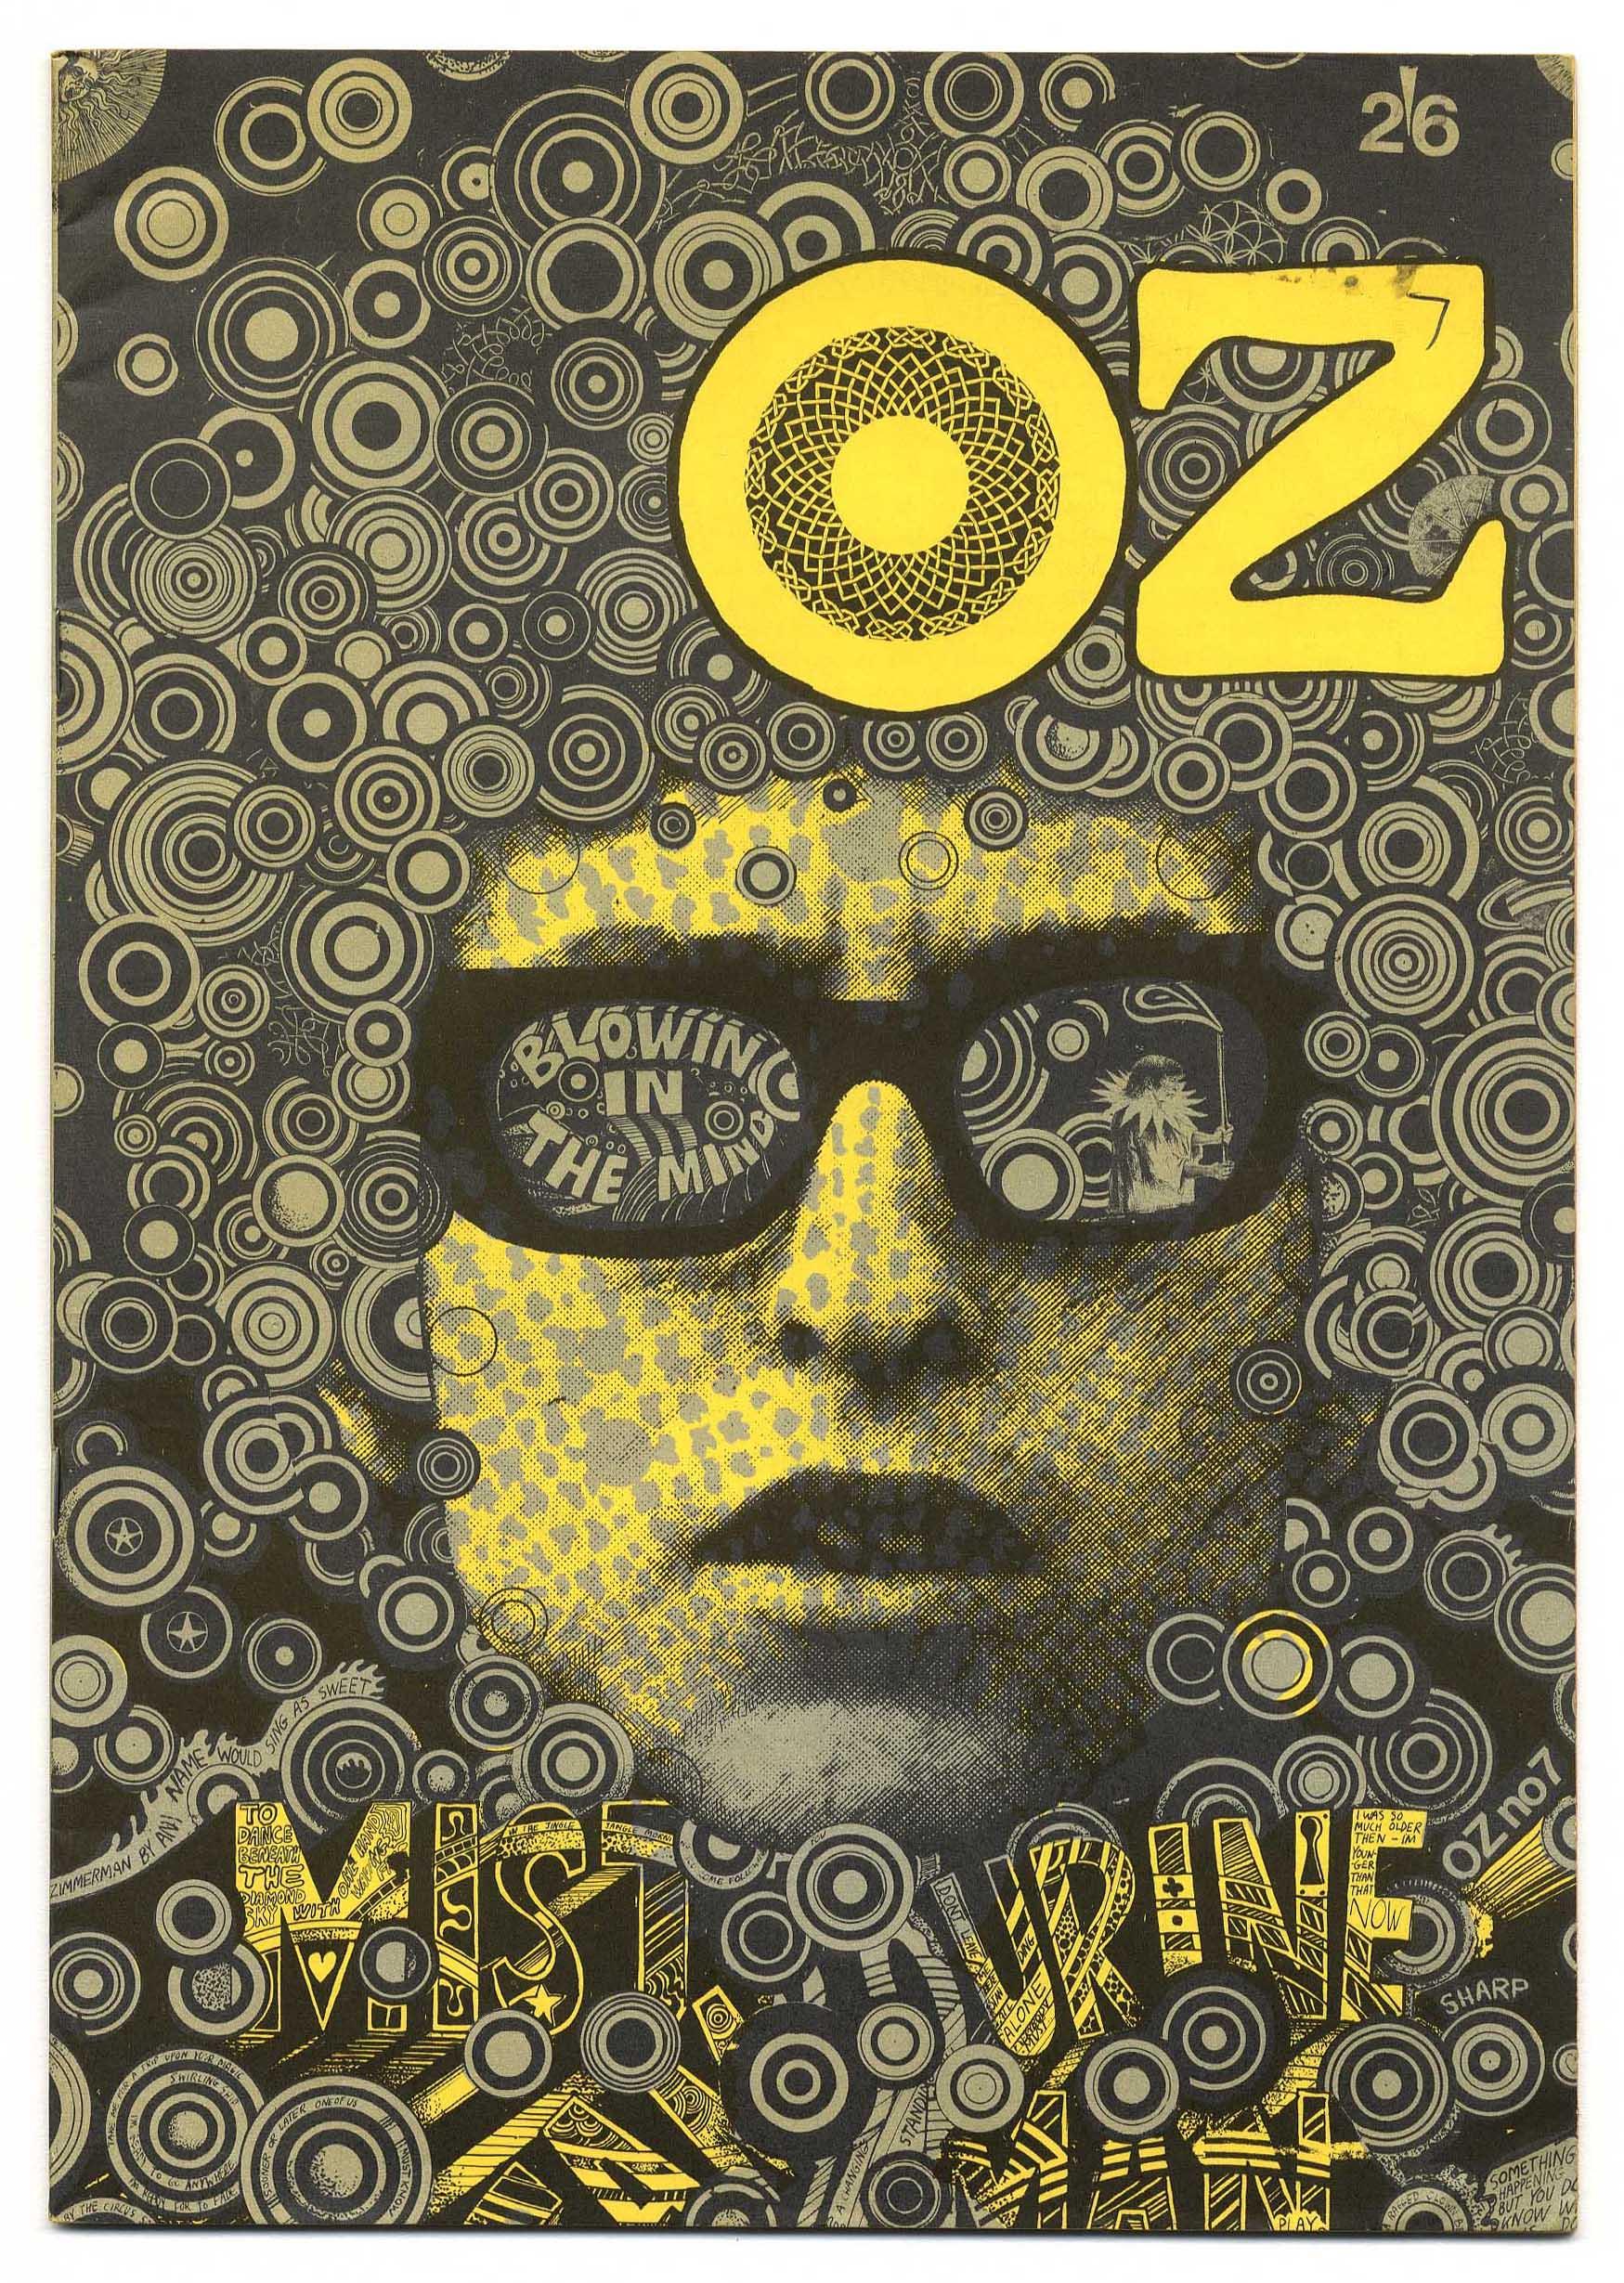 oz-magazine-no-7-oct-nov-1967-martin-sharp-bob-dylan-cover-10487-p.jpg